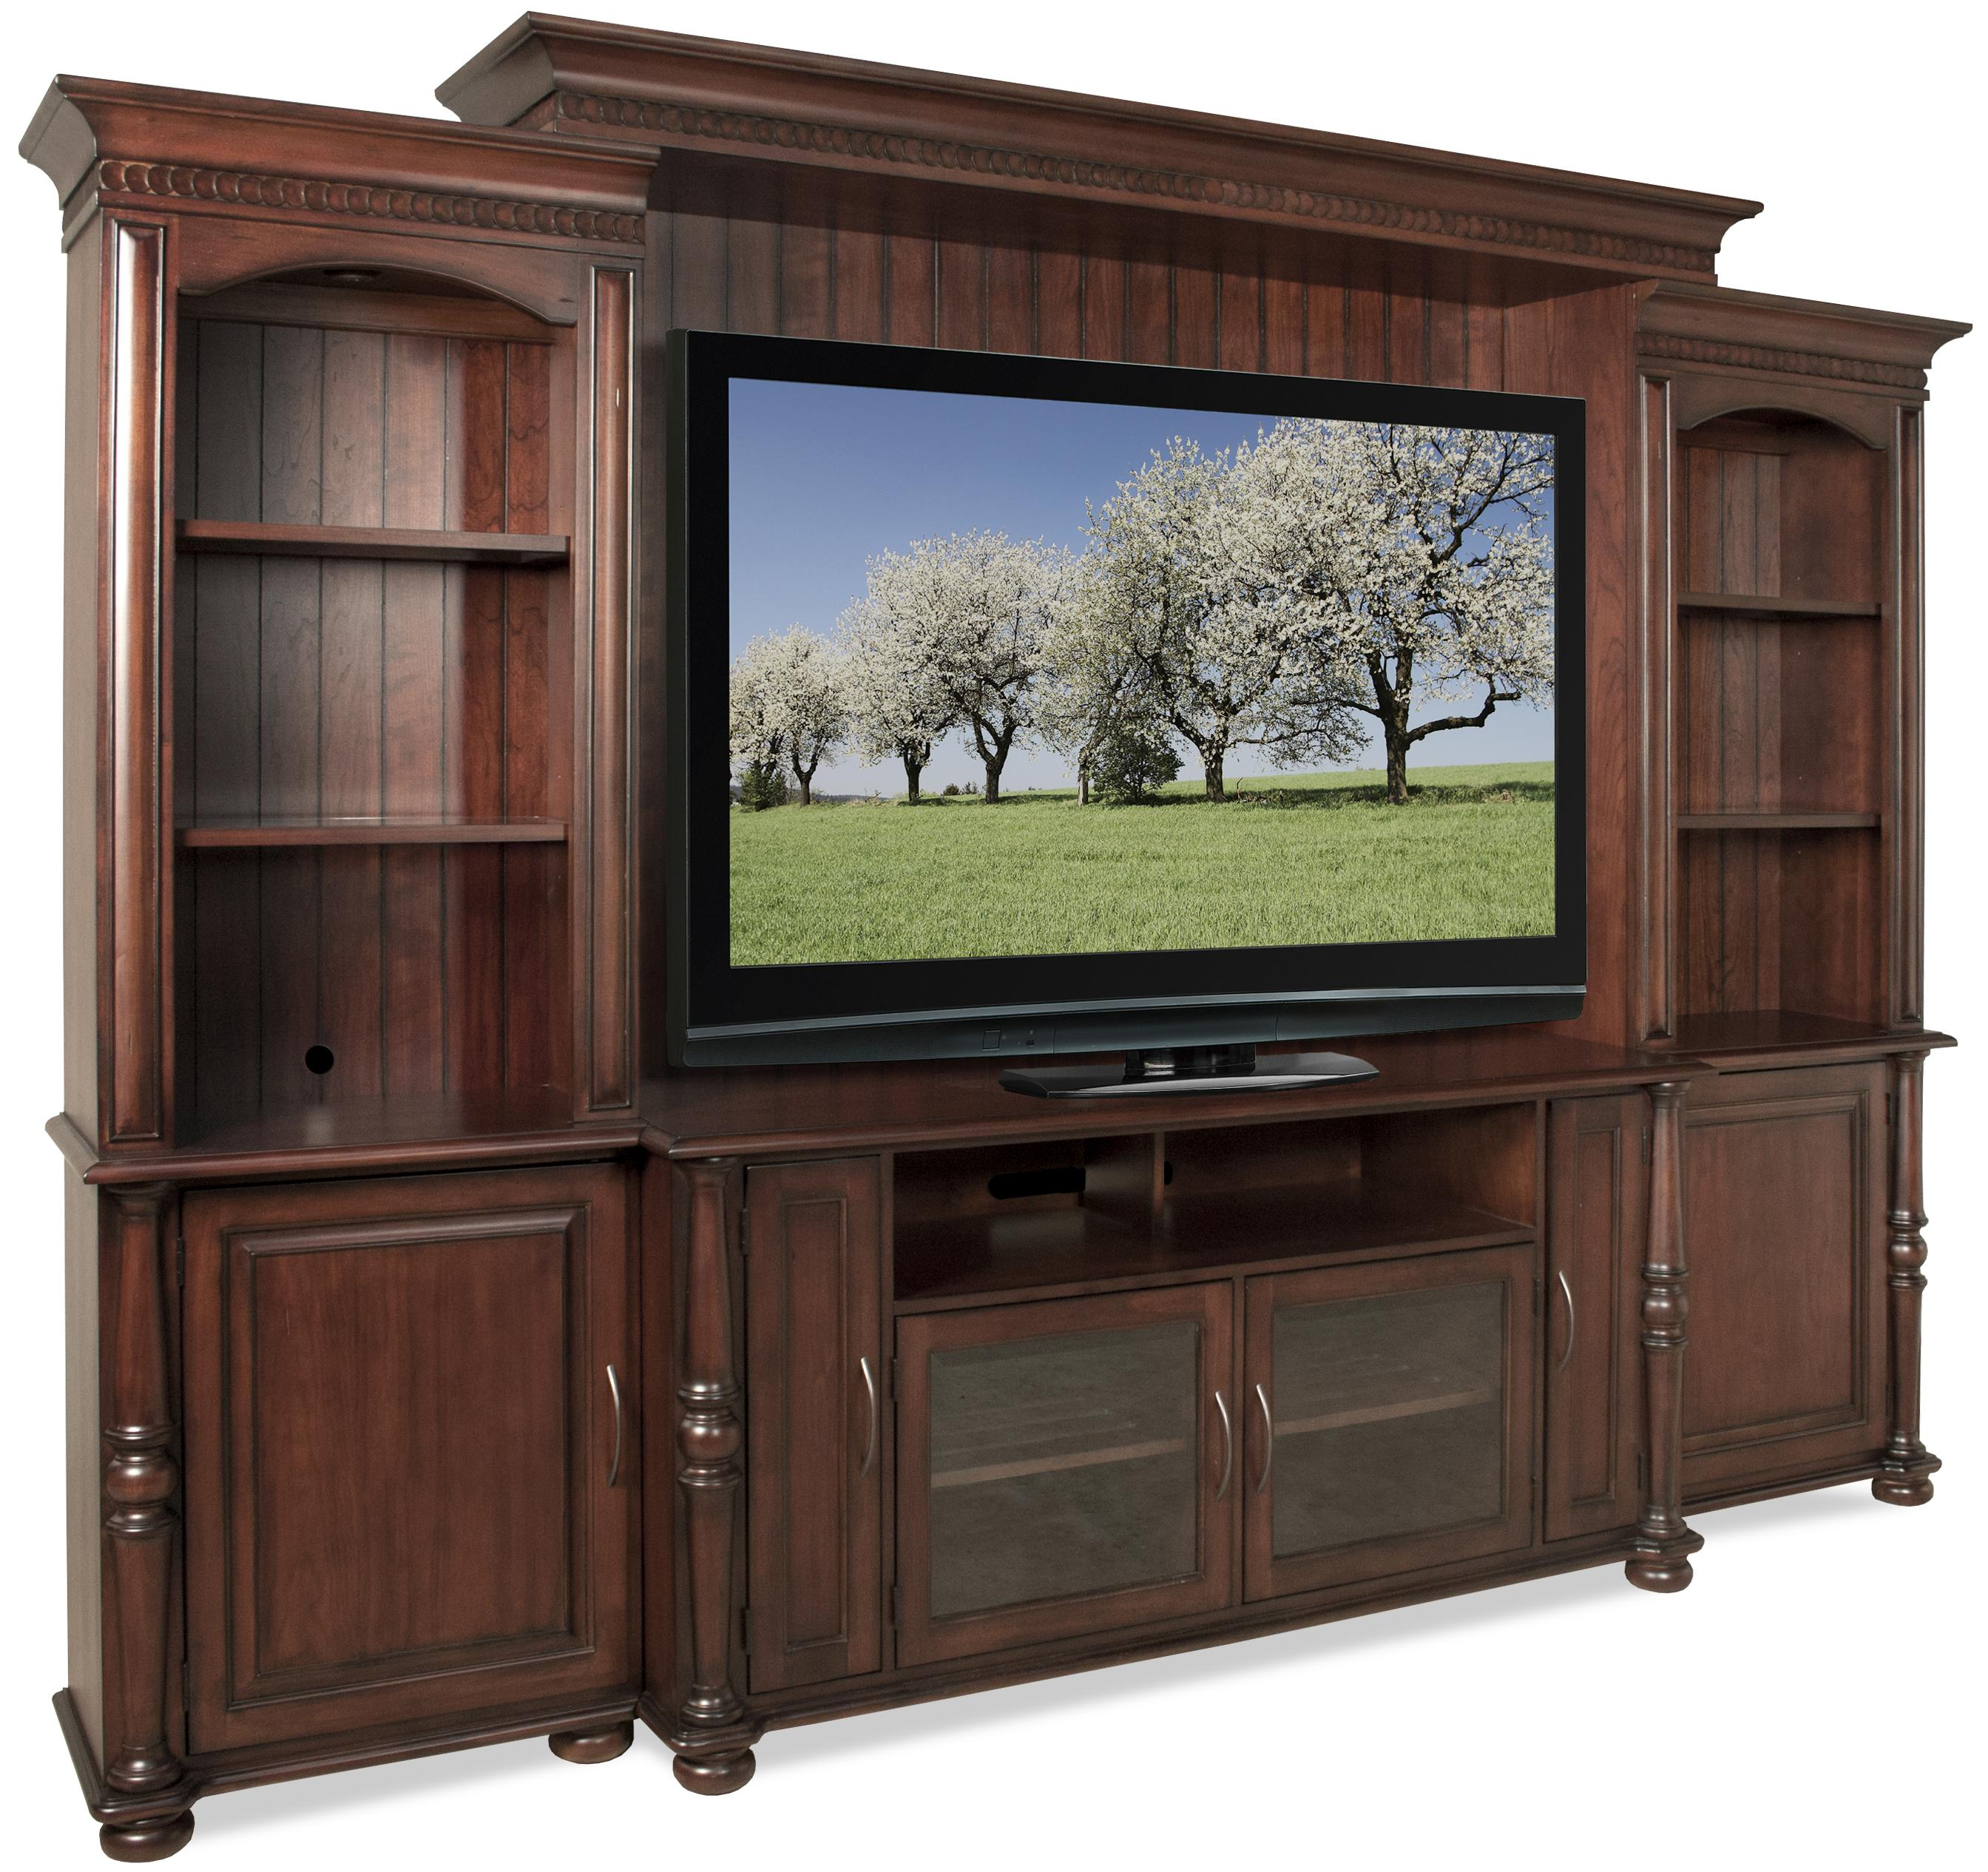 Riverside Furniture Dunmore Entertainment Wall Unit - Item Number: 65640+43+48+49